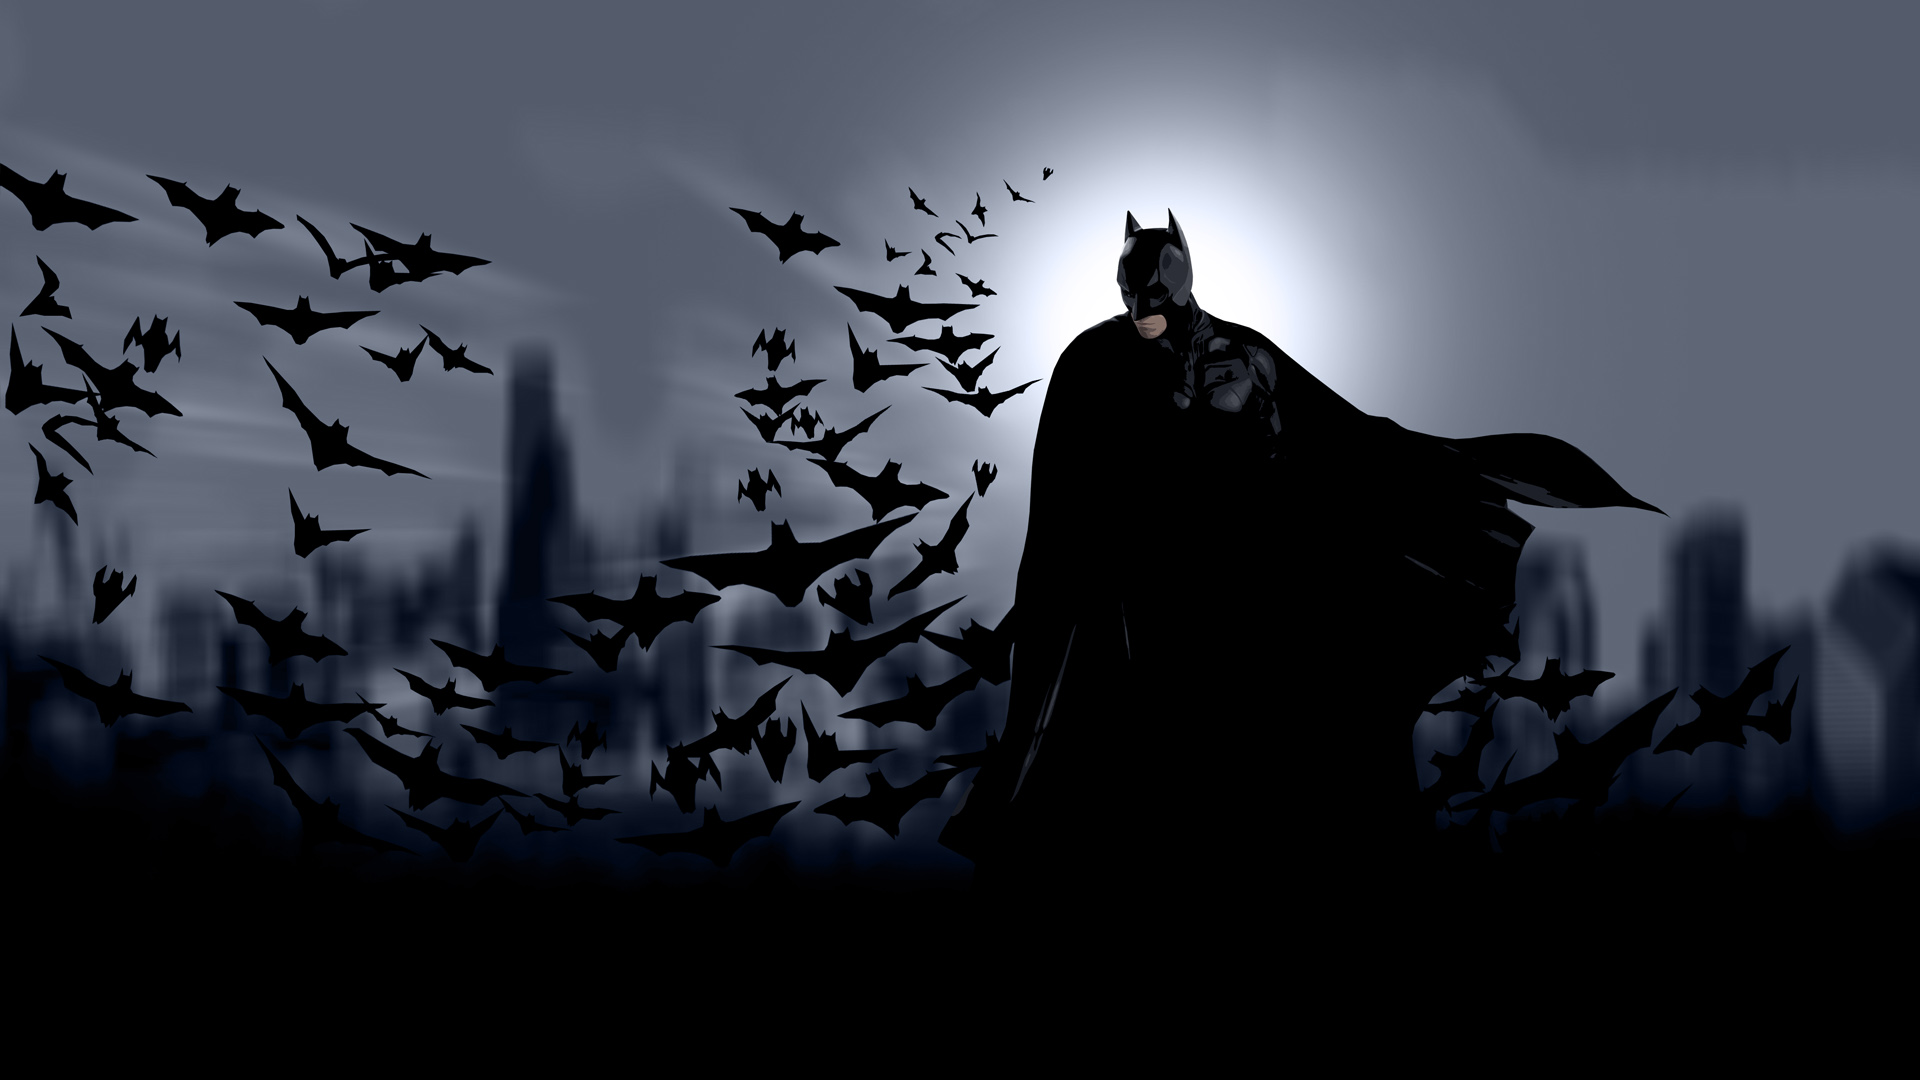 Enjoy our wallpaper of the week Batman Batman wallpapers 1920x1080